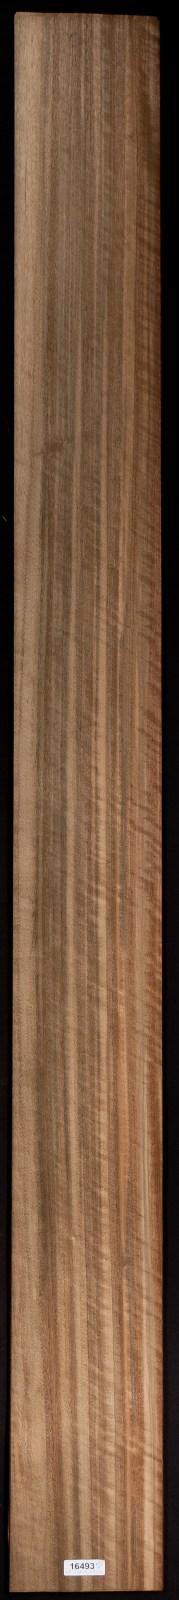 AAA Quartersawn Walnut (Australian) Veneer Lot